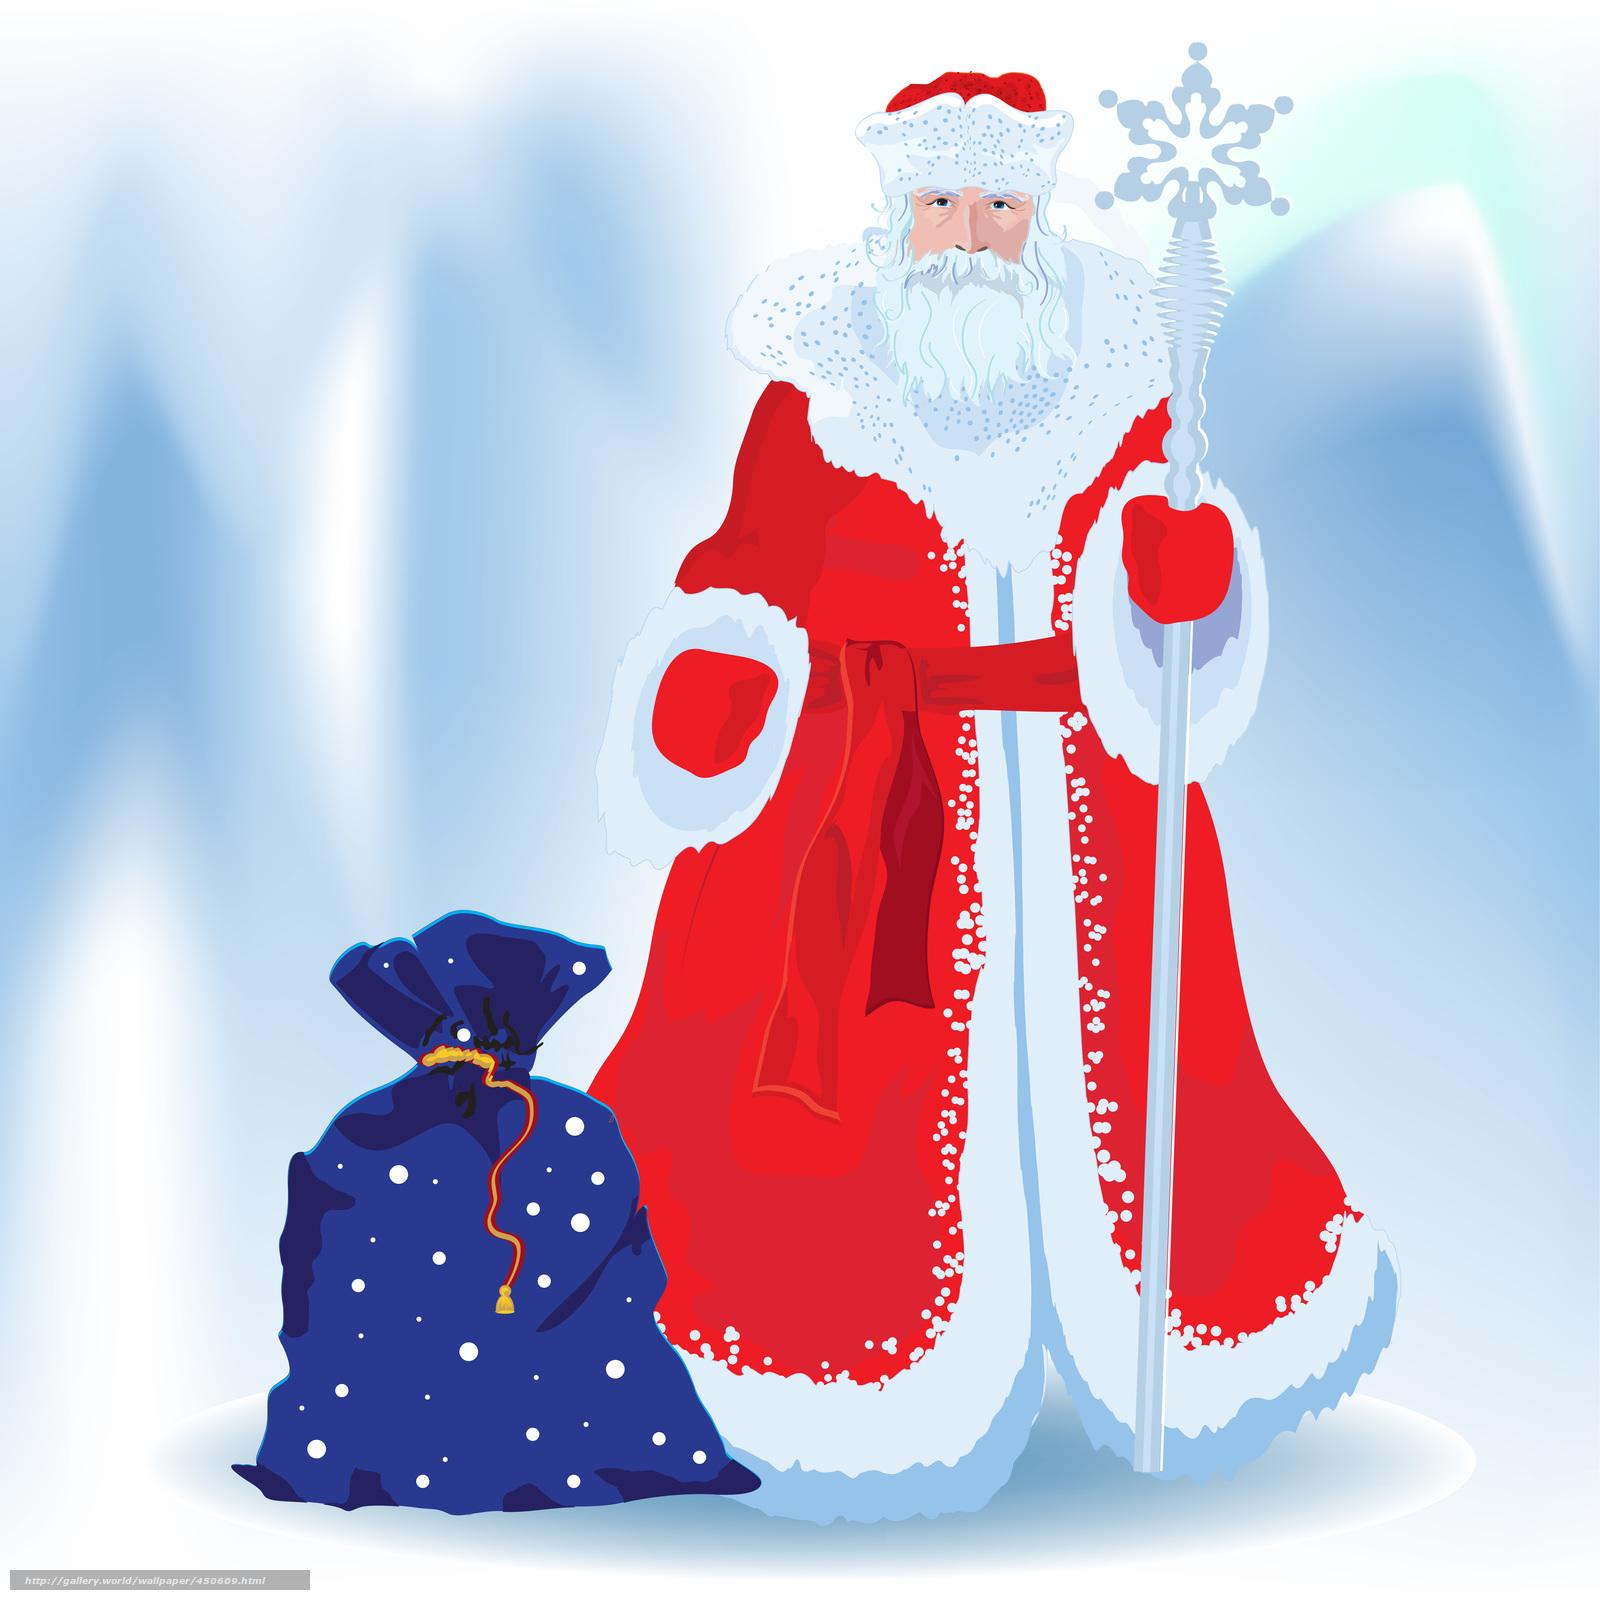 Дед мороз с мешком и посохом картинка